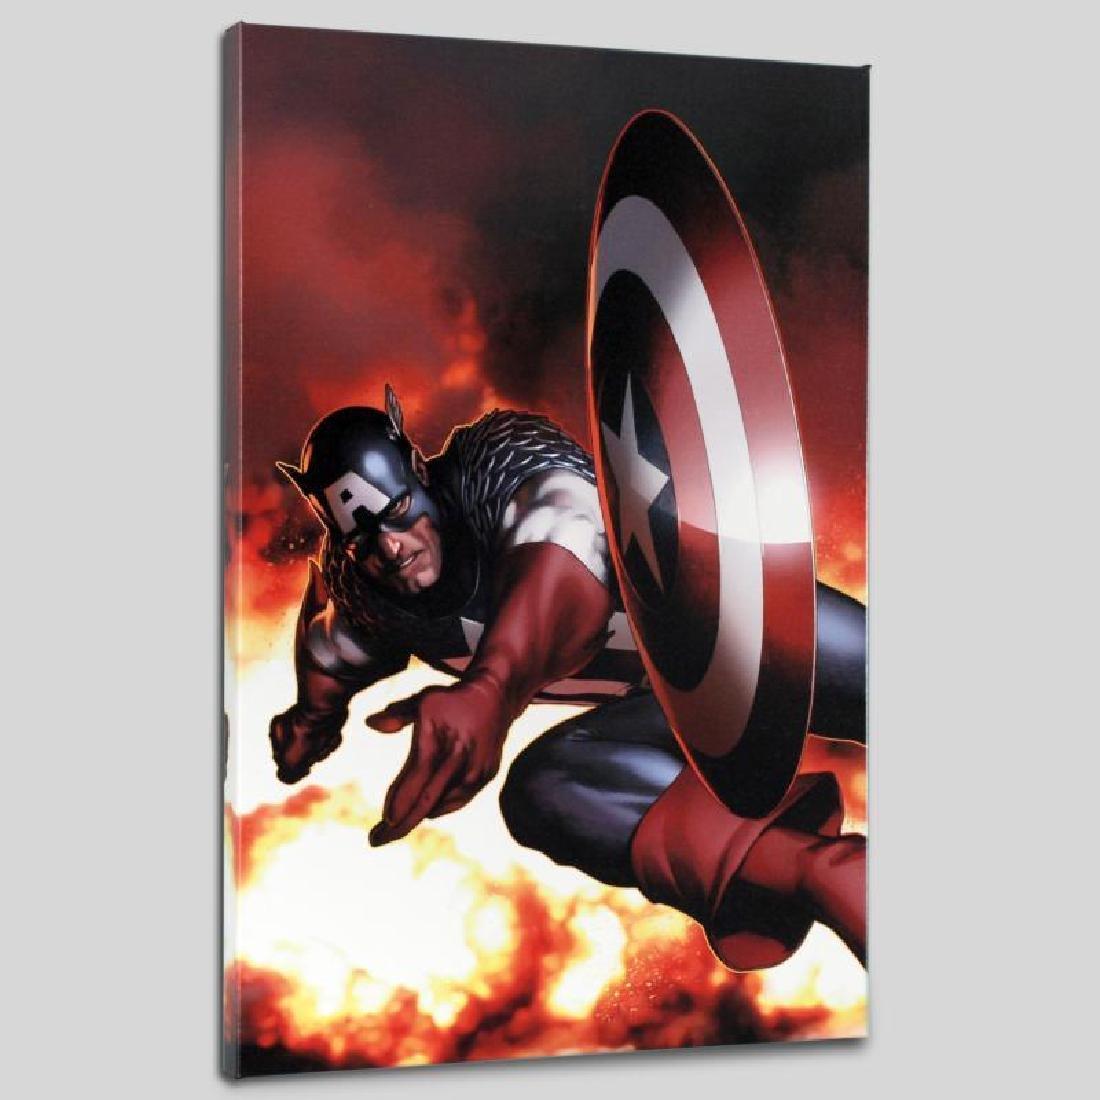 Captain America #2 by Marvel Comics - 3